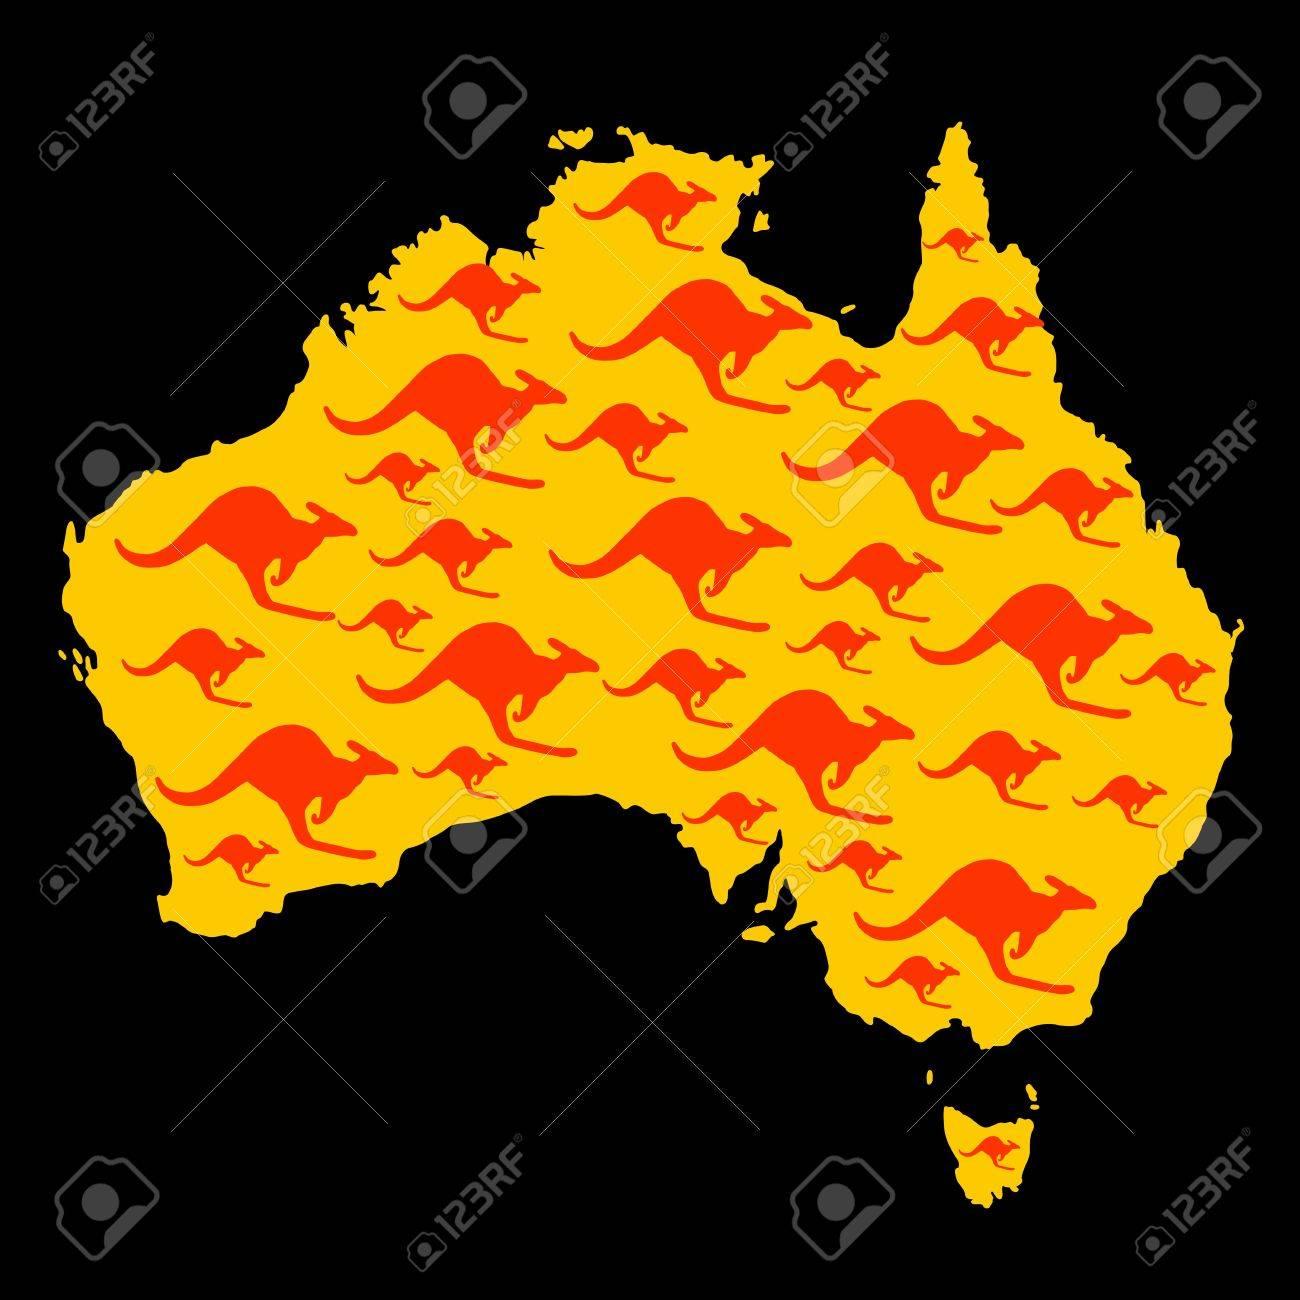 Map Of Australia With Kangaroo Shape Pattern Royalty Free - Australia map kangaroo